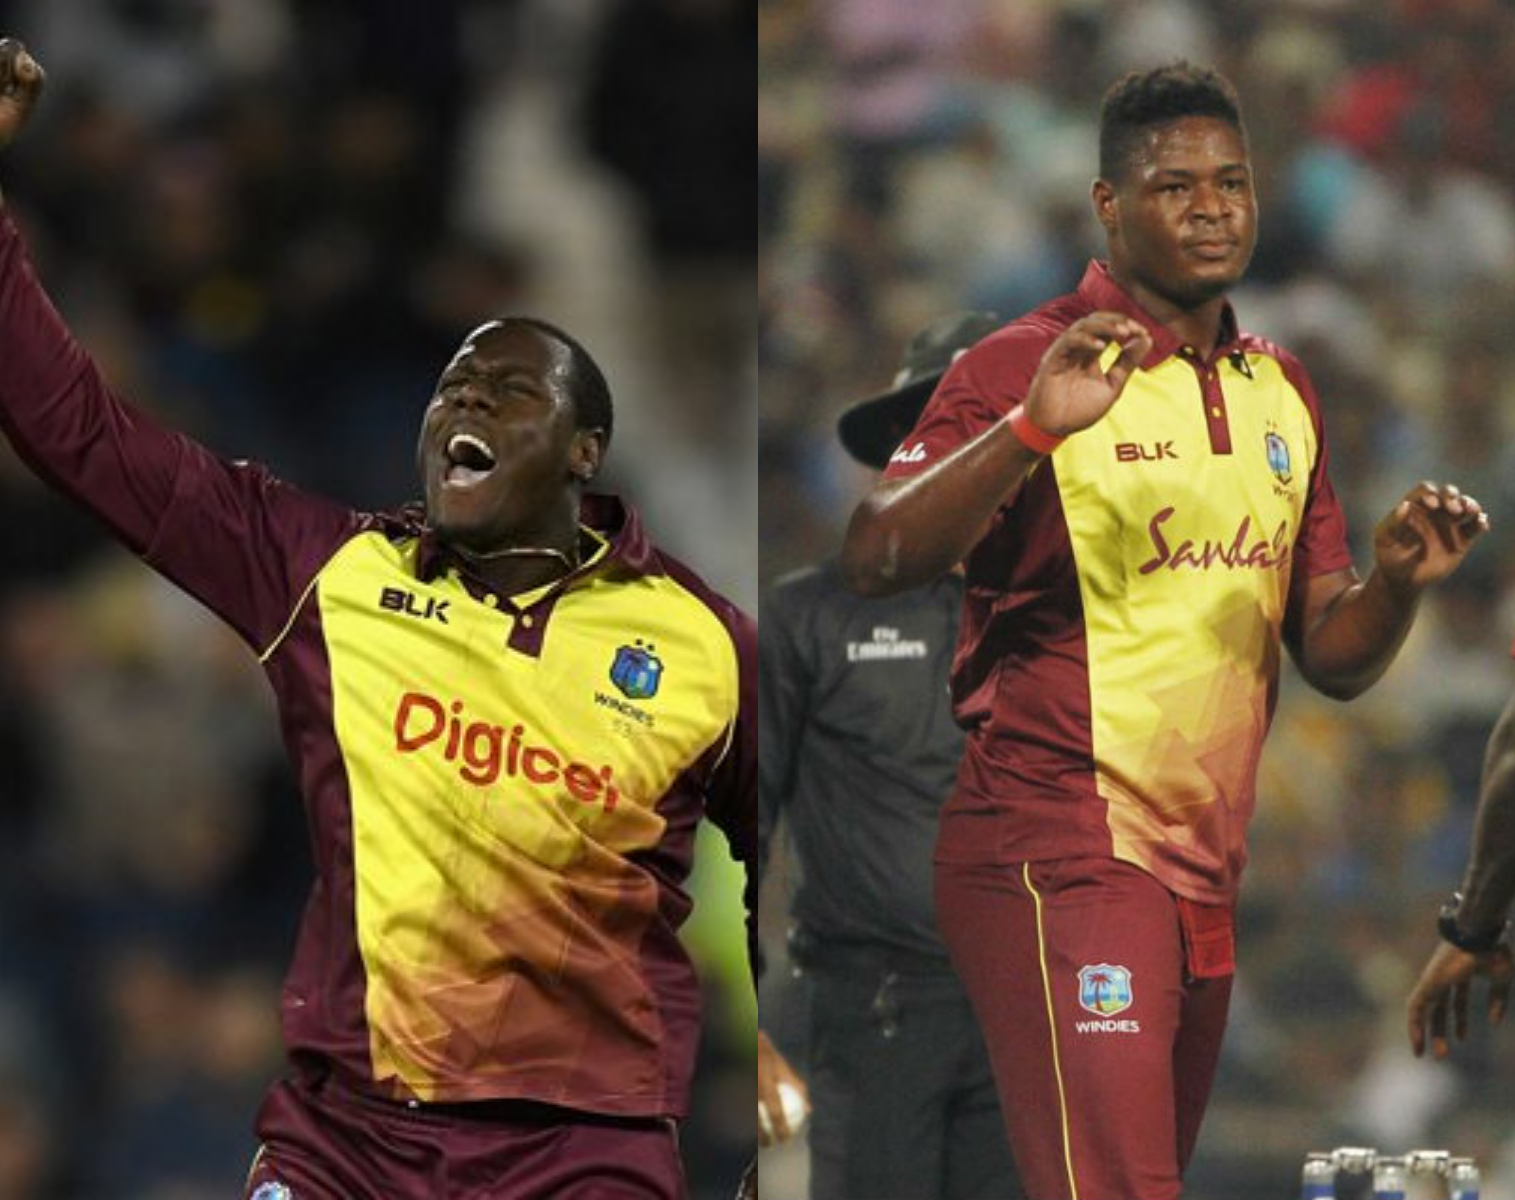 Carlos Brathwaite and Oshane Thomas made the Indian batsmen work hard for runs